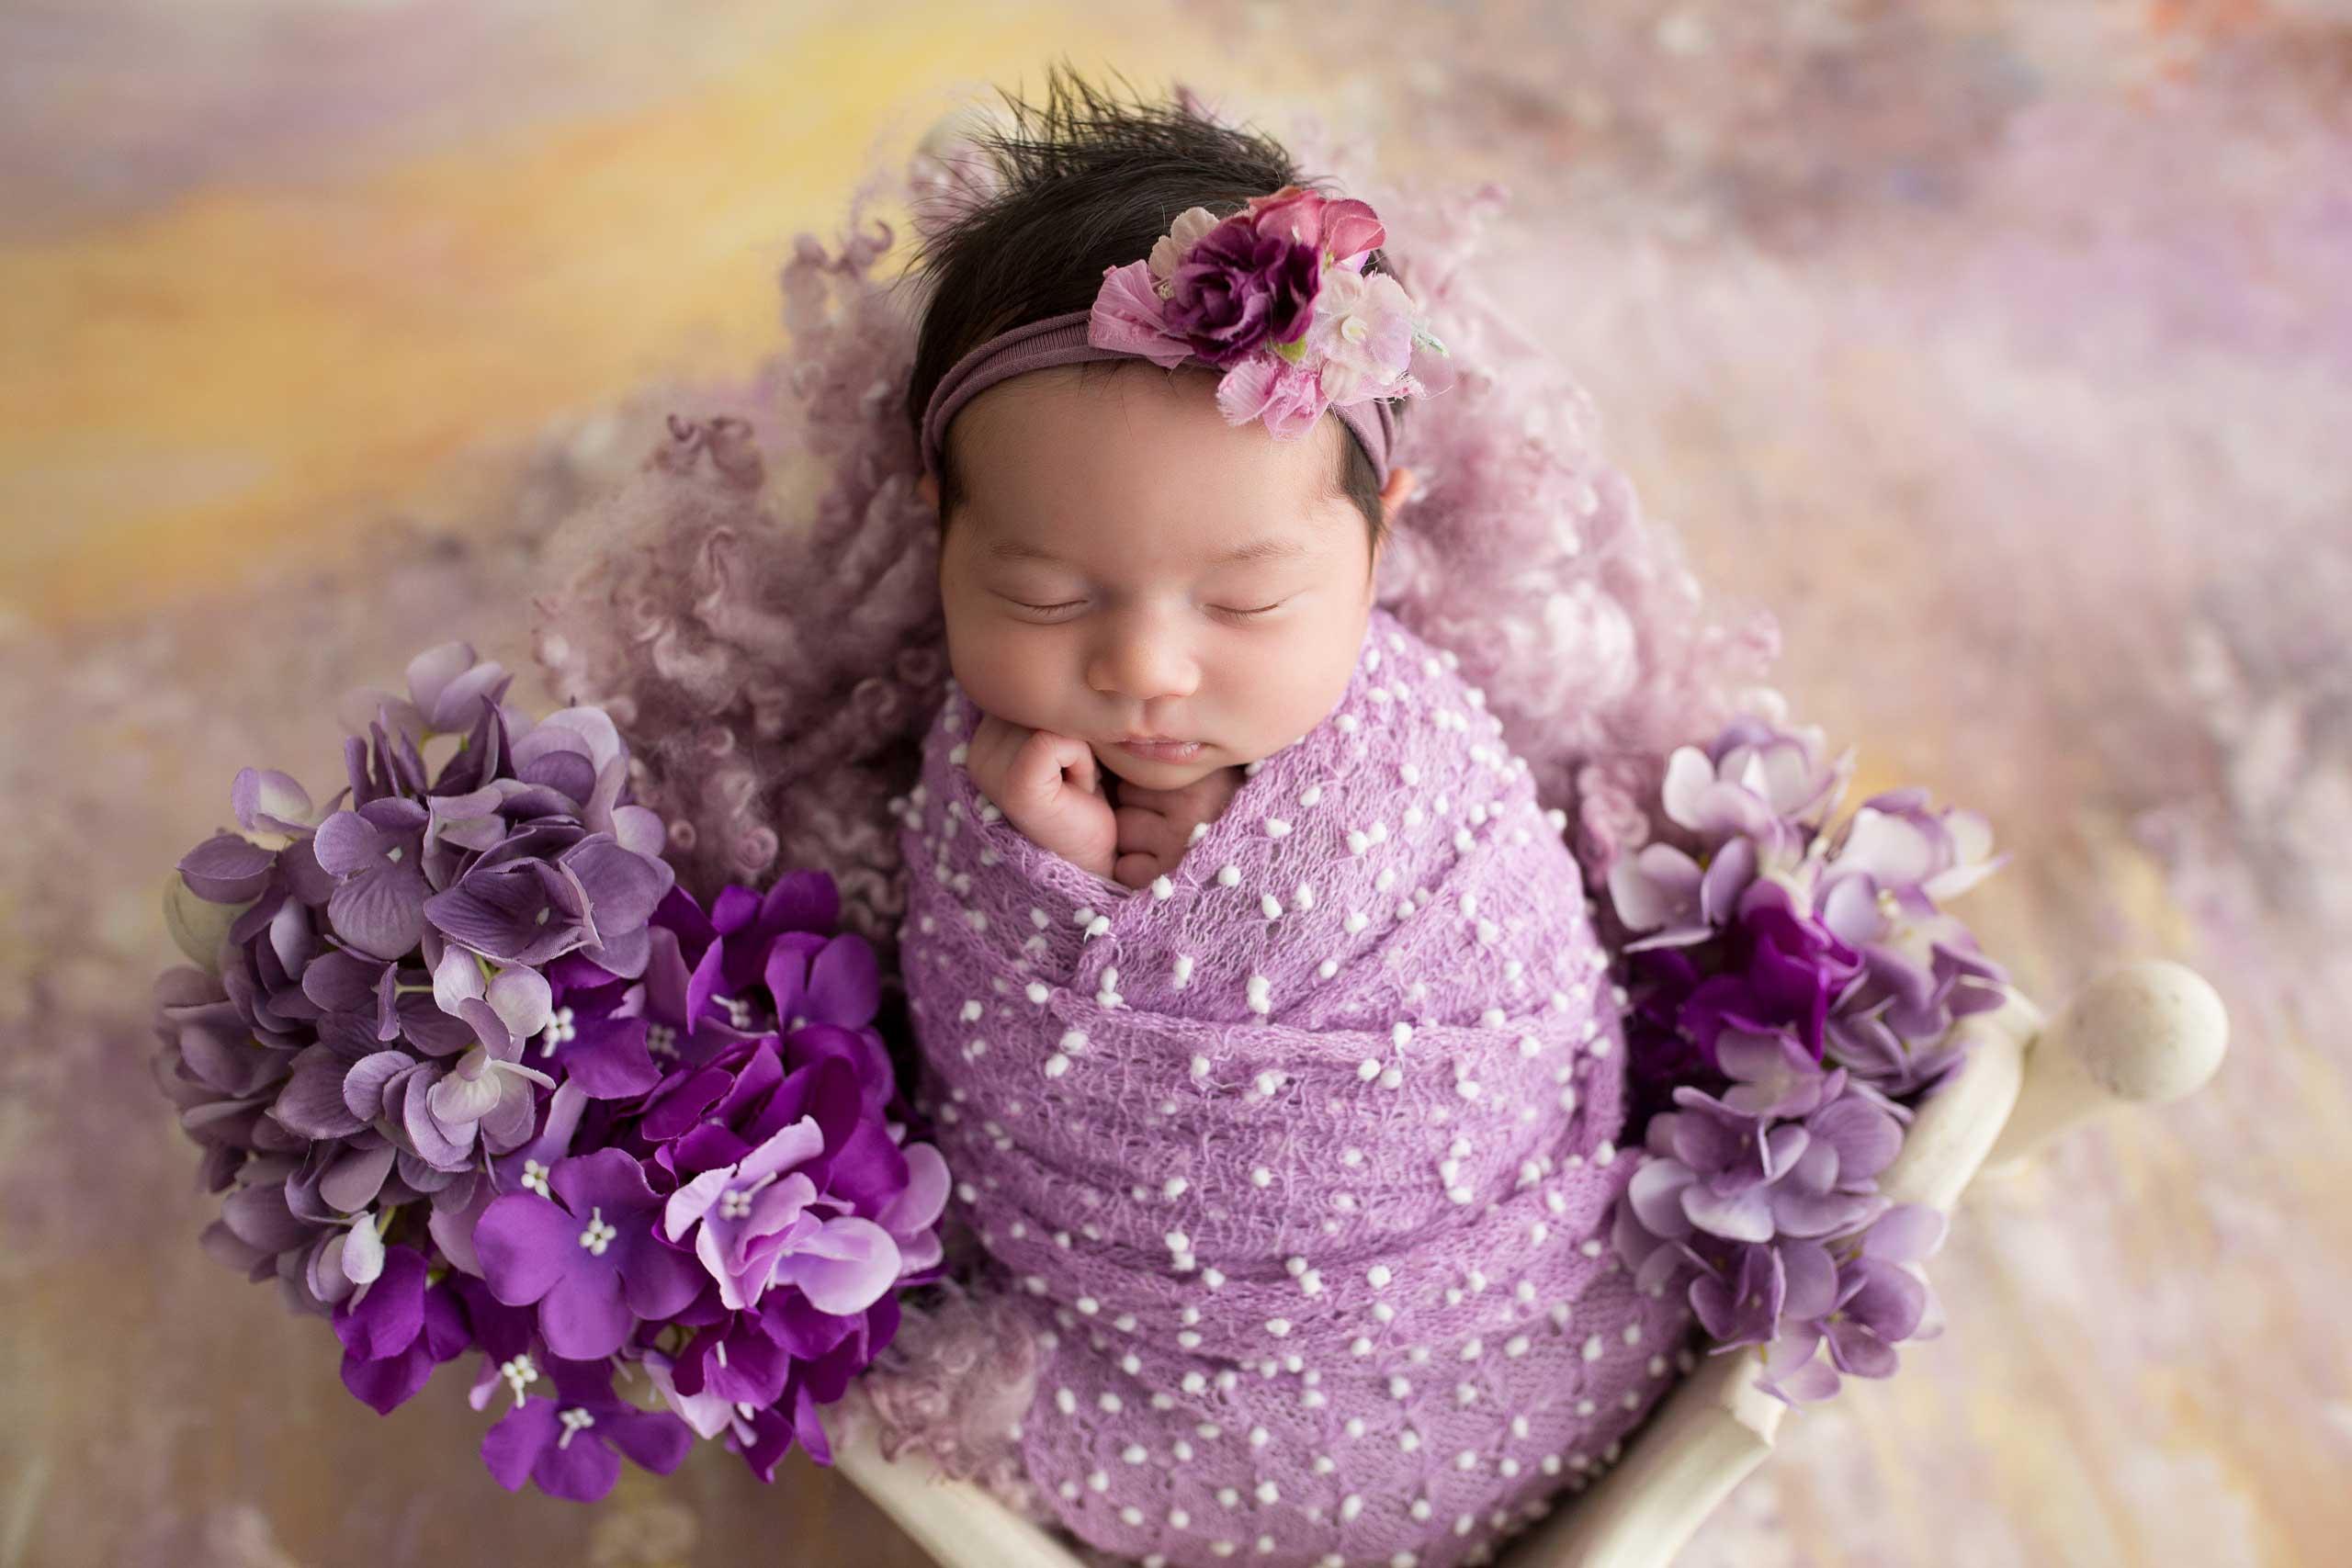 Ramina Magid Newborn Photography Los Angeles 5354